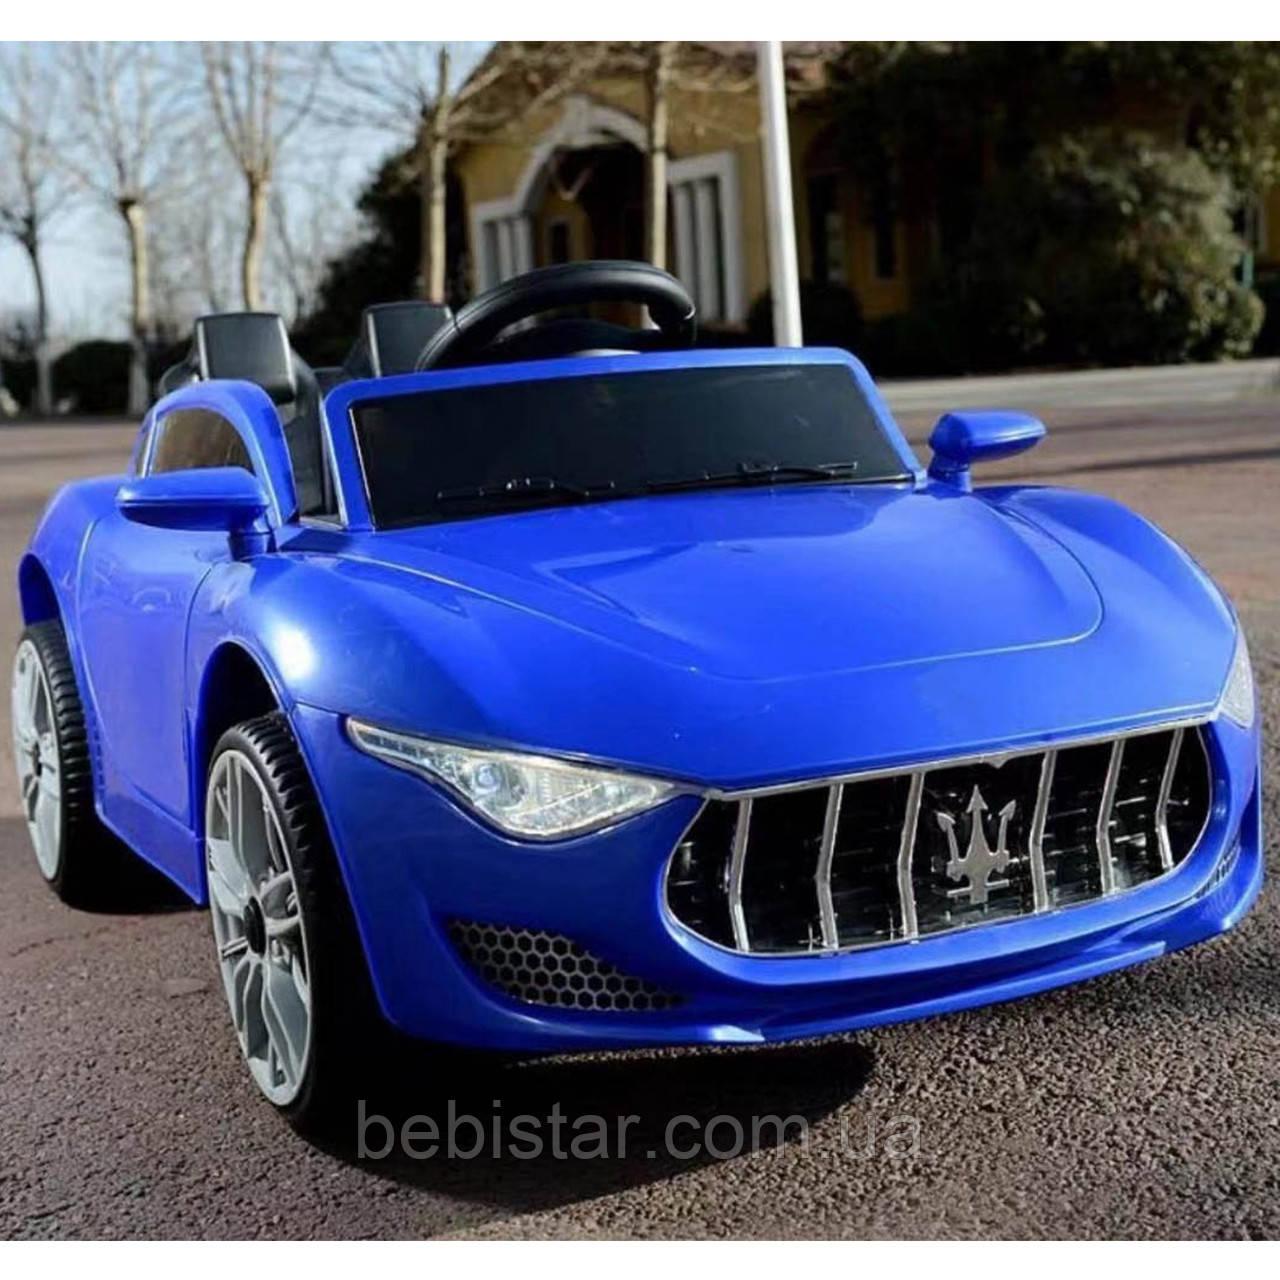 Электромобиль спорткар T-7637 BLUE для деток 3-8 лет с пультом мотор 2*25W с МР3